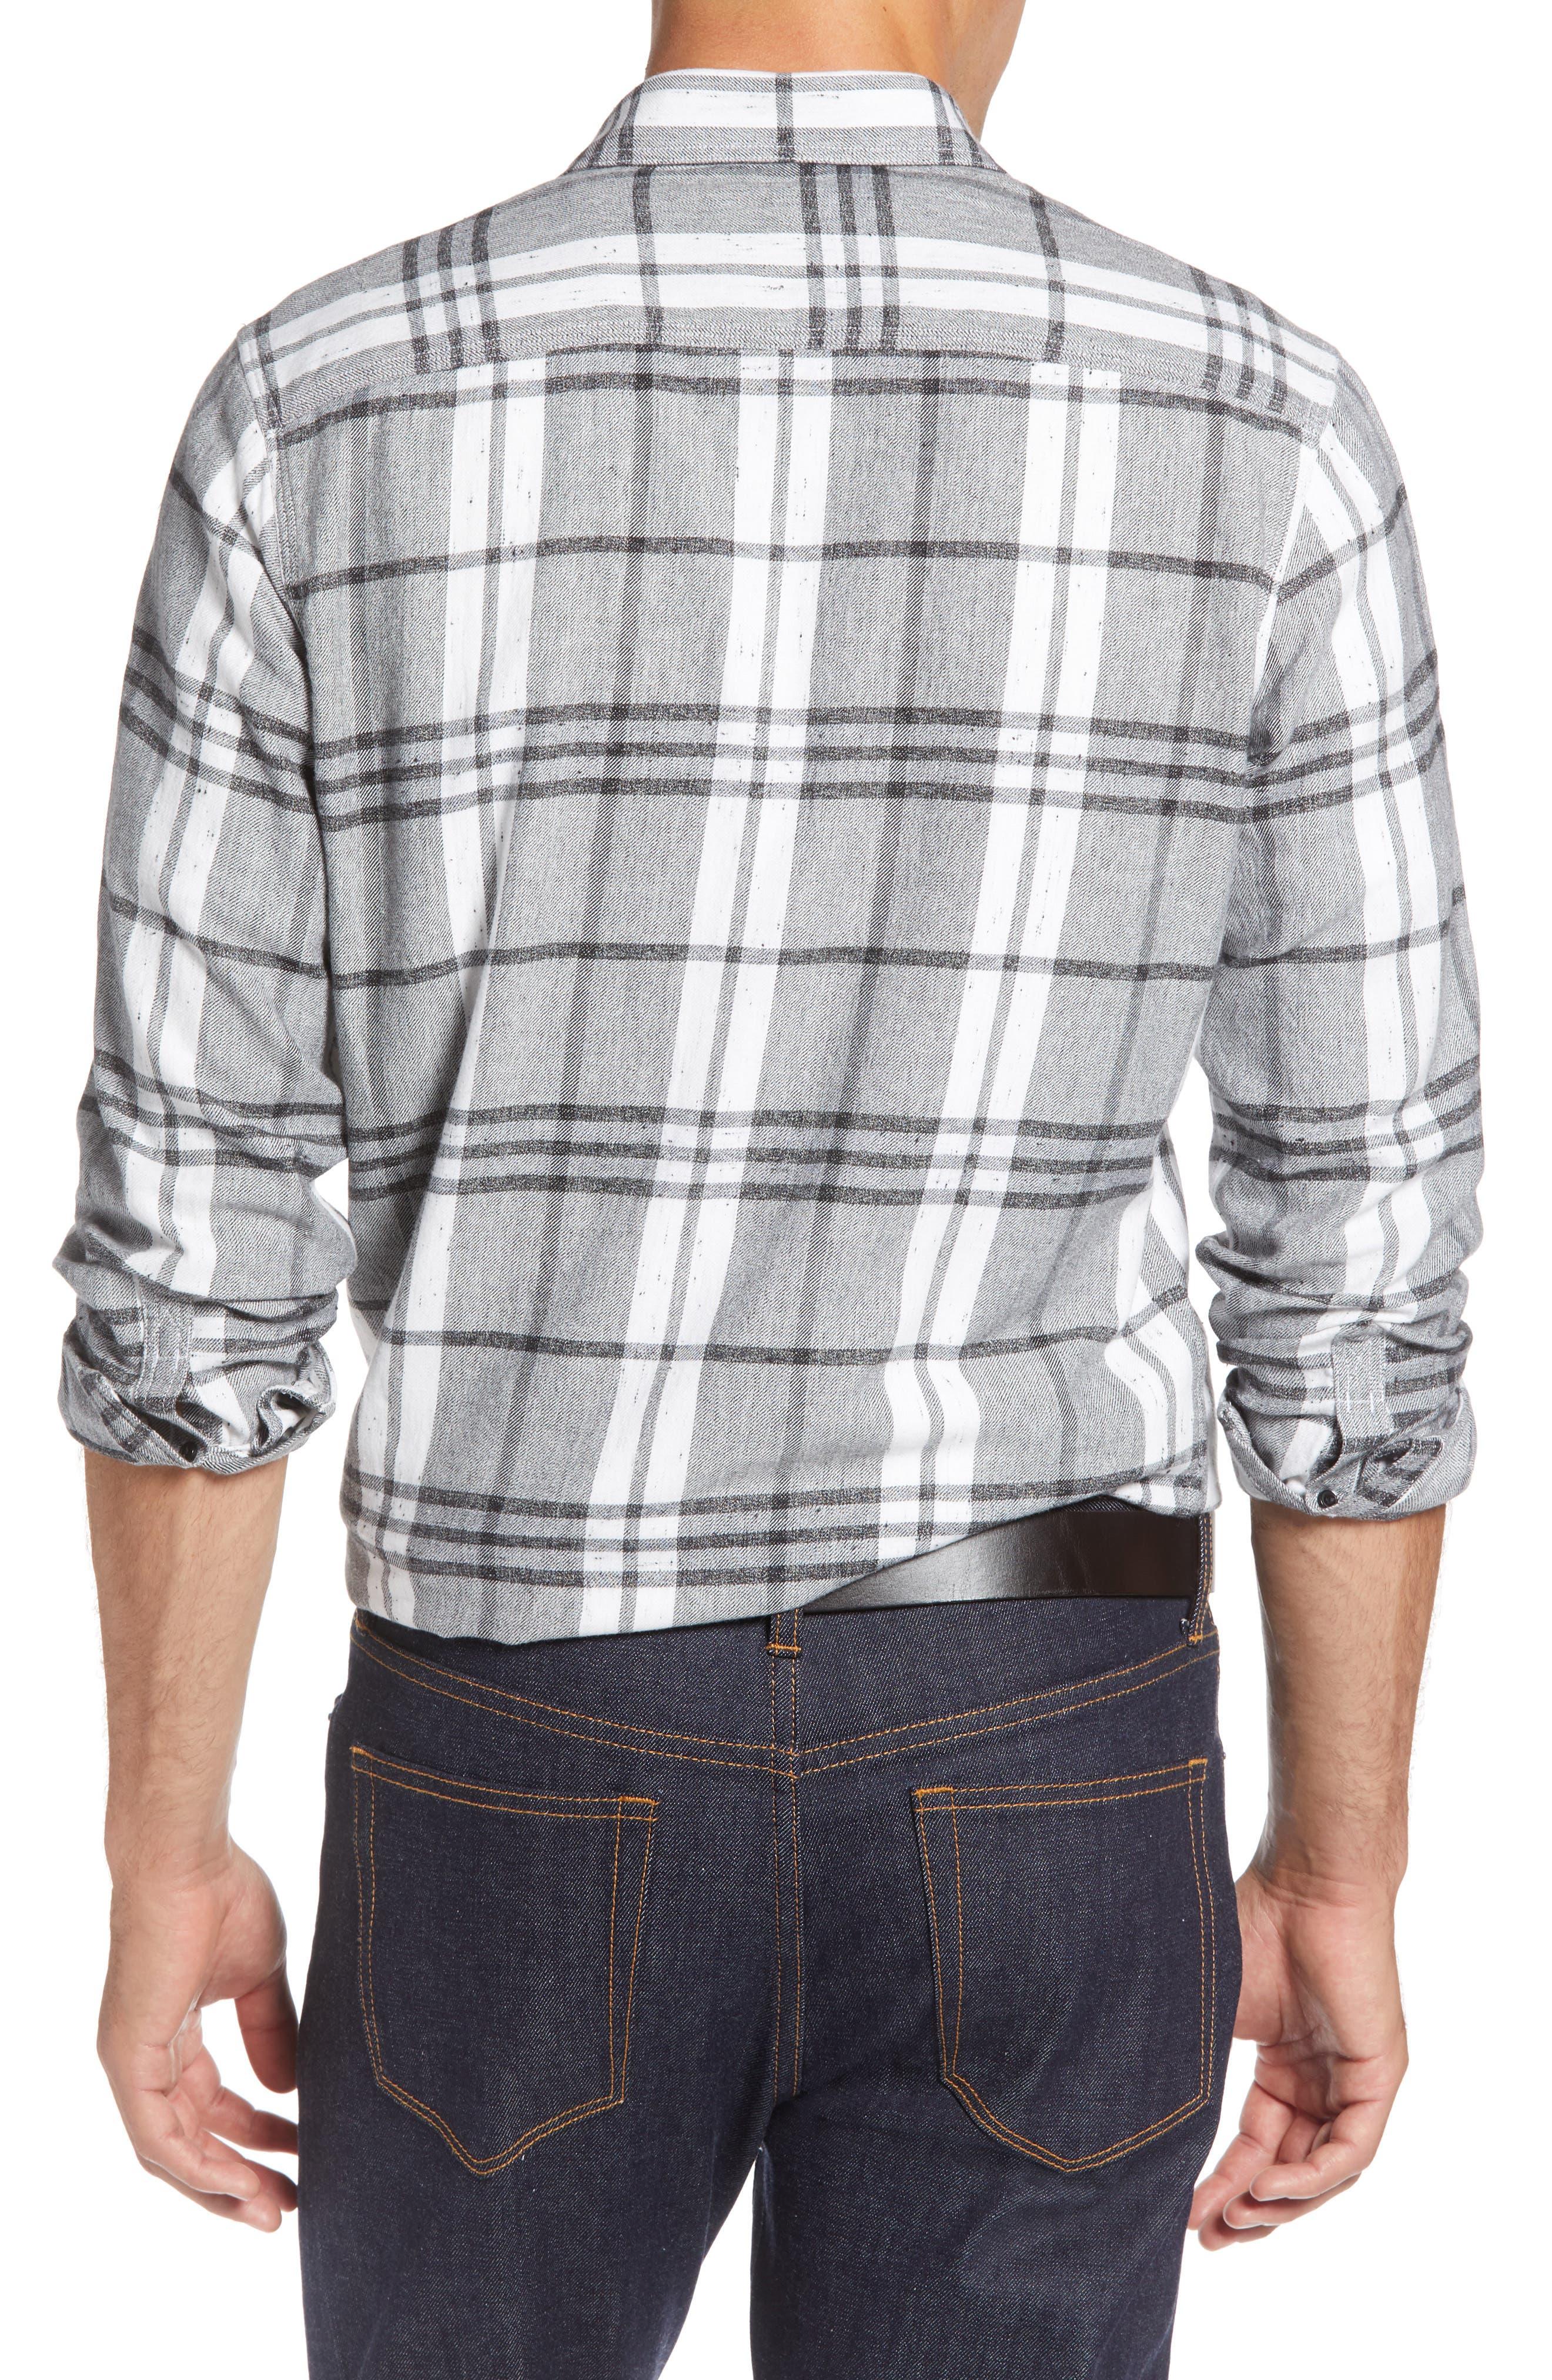 Trim Fit Brushed Plaid Utility Shirt,                             Alternate thumbnail 3, color,                             GREY CASTLEROCK NEP PLAID